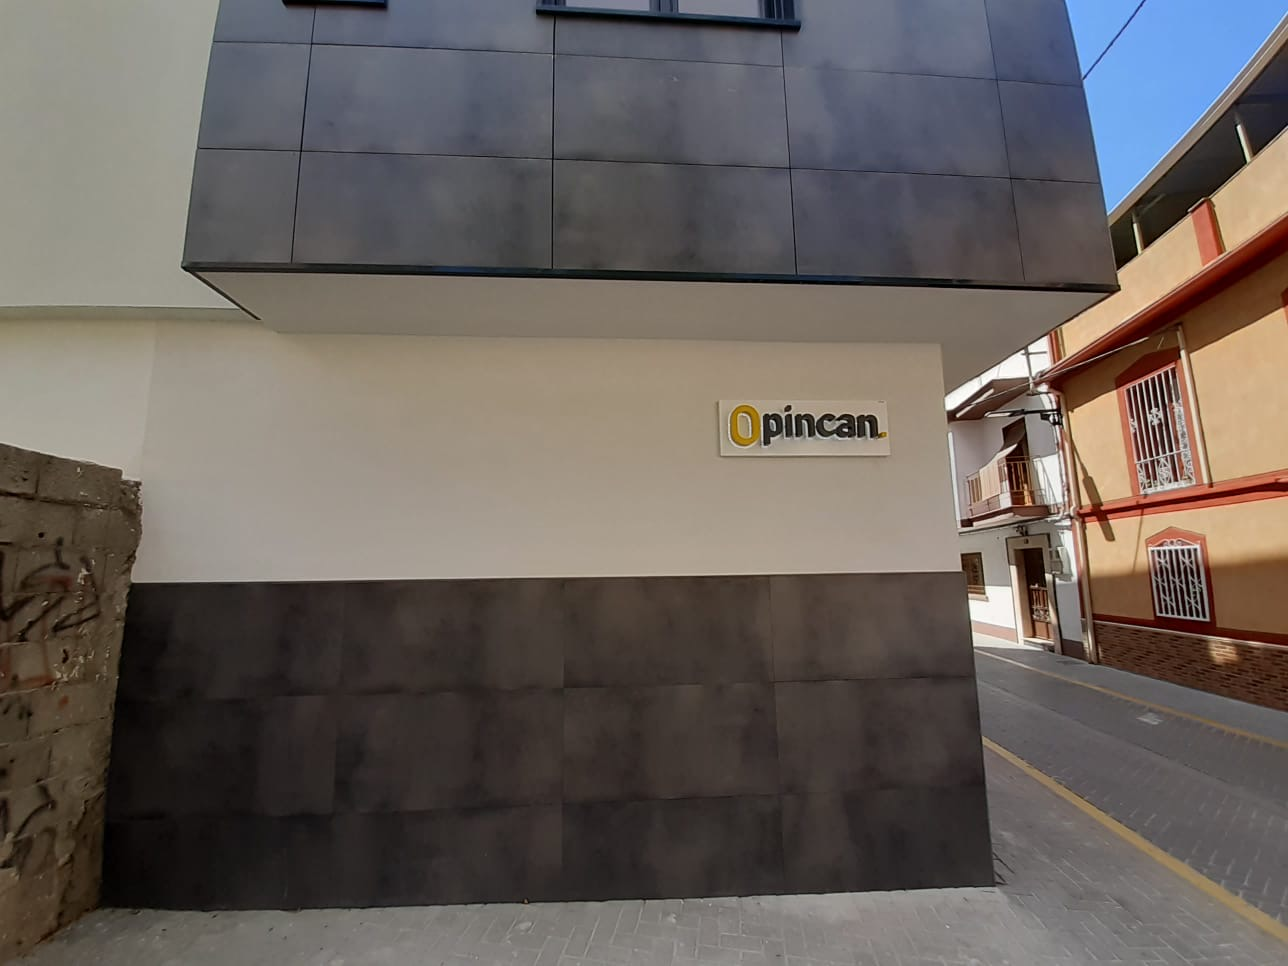 Residencial Almireceros - Opincan